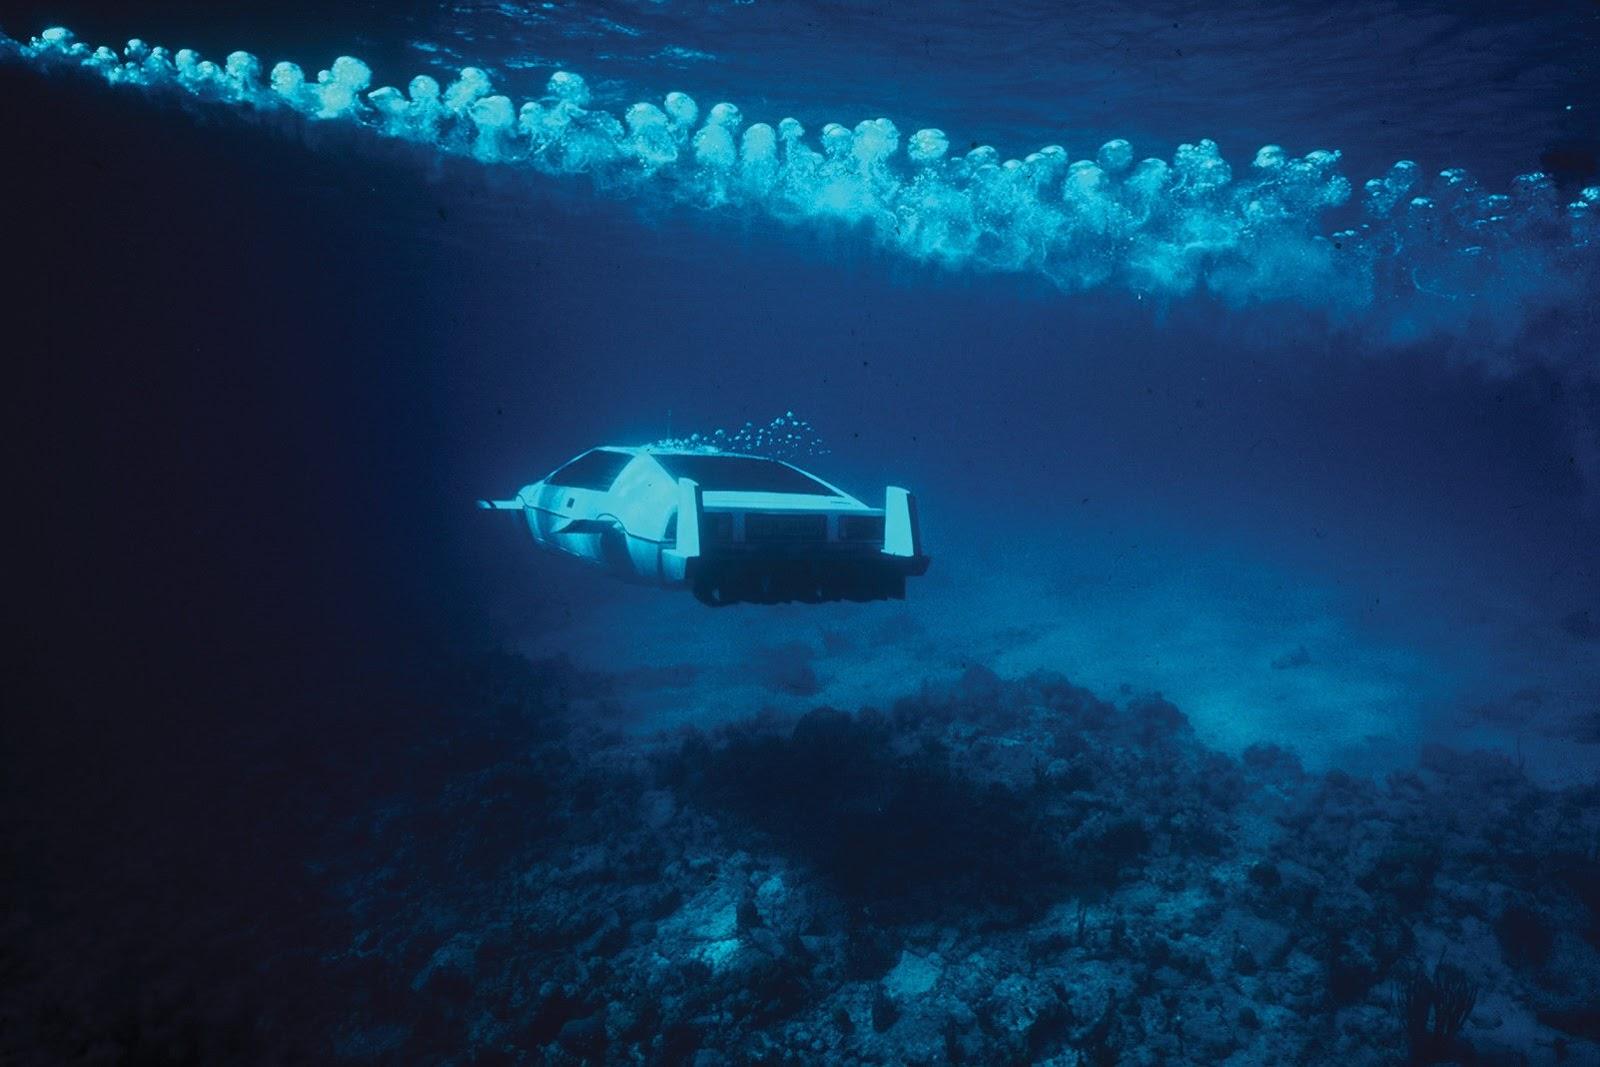 1977-lotus-esprit-submarine-james-bond-10